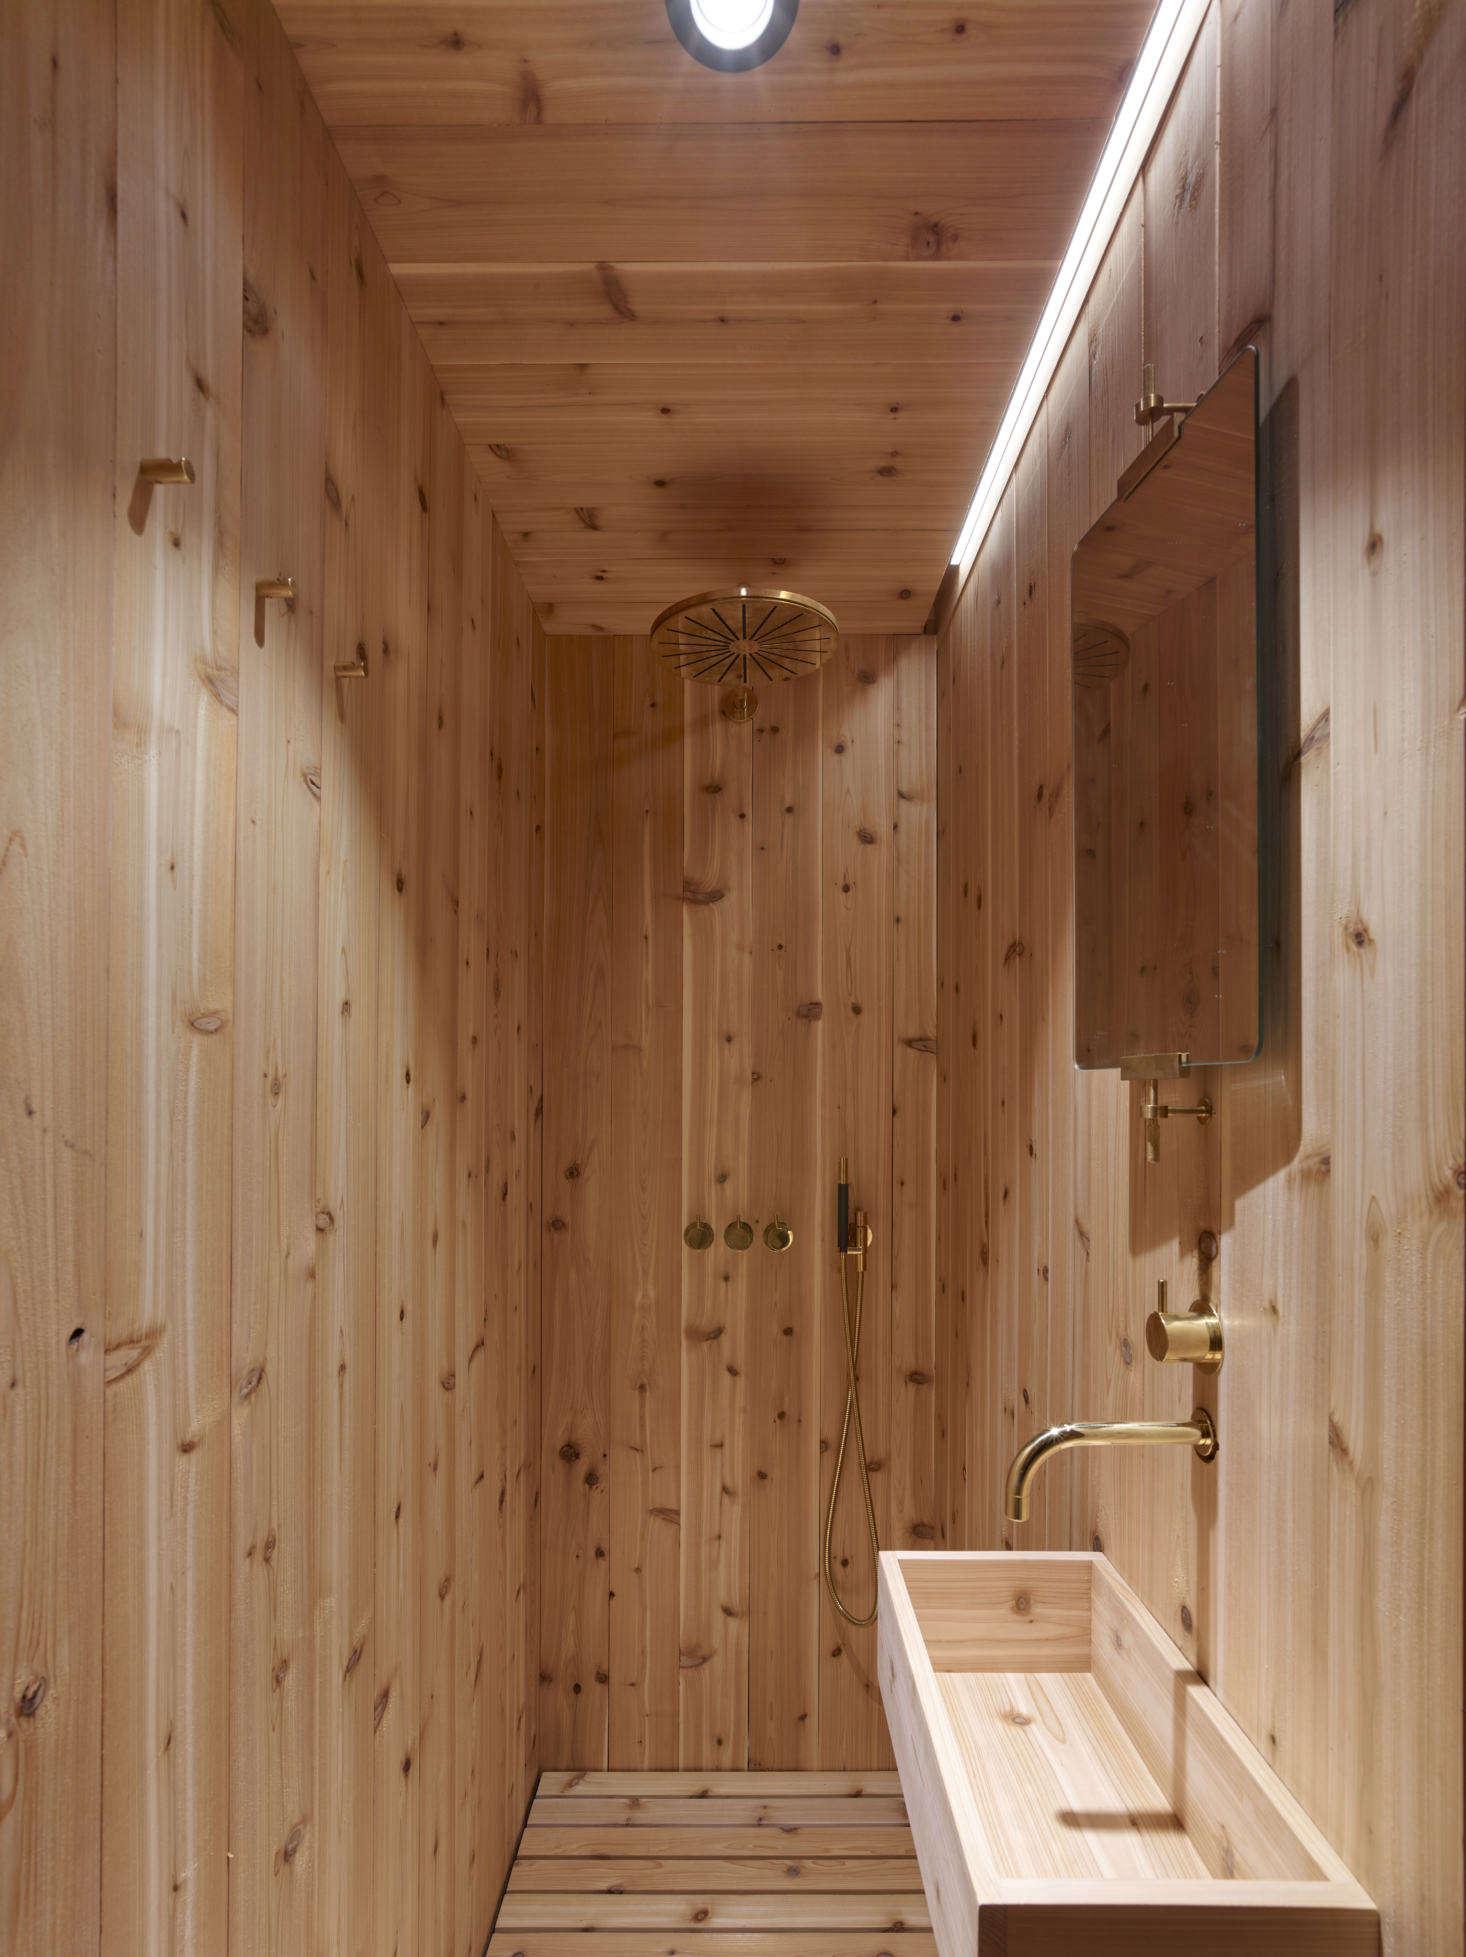 The bathroom is all cedar, down to the trough sink.